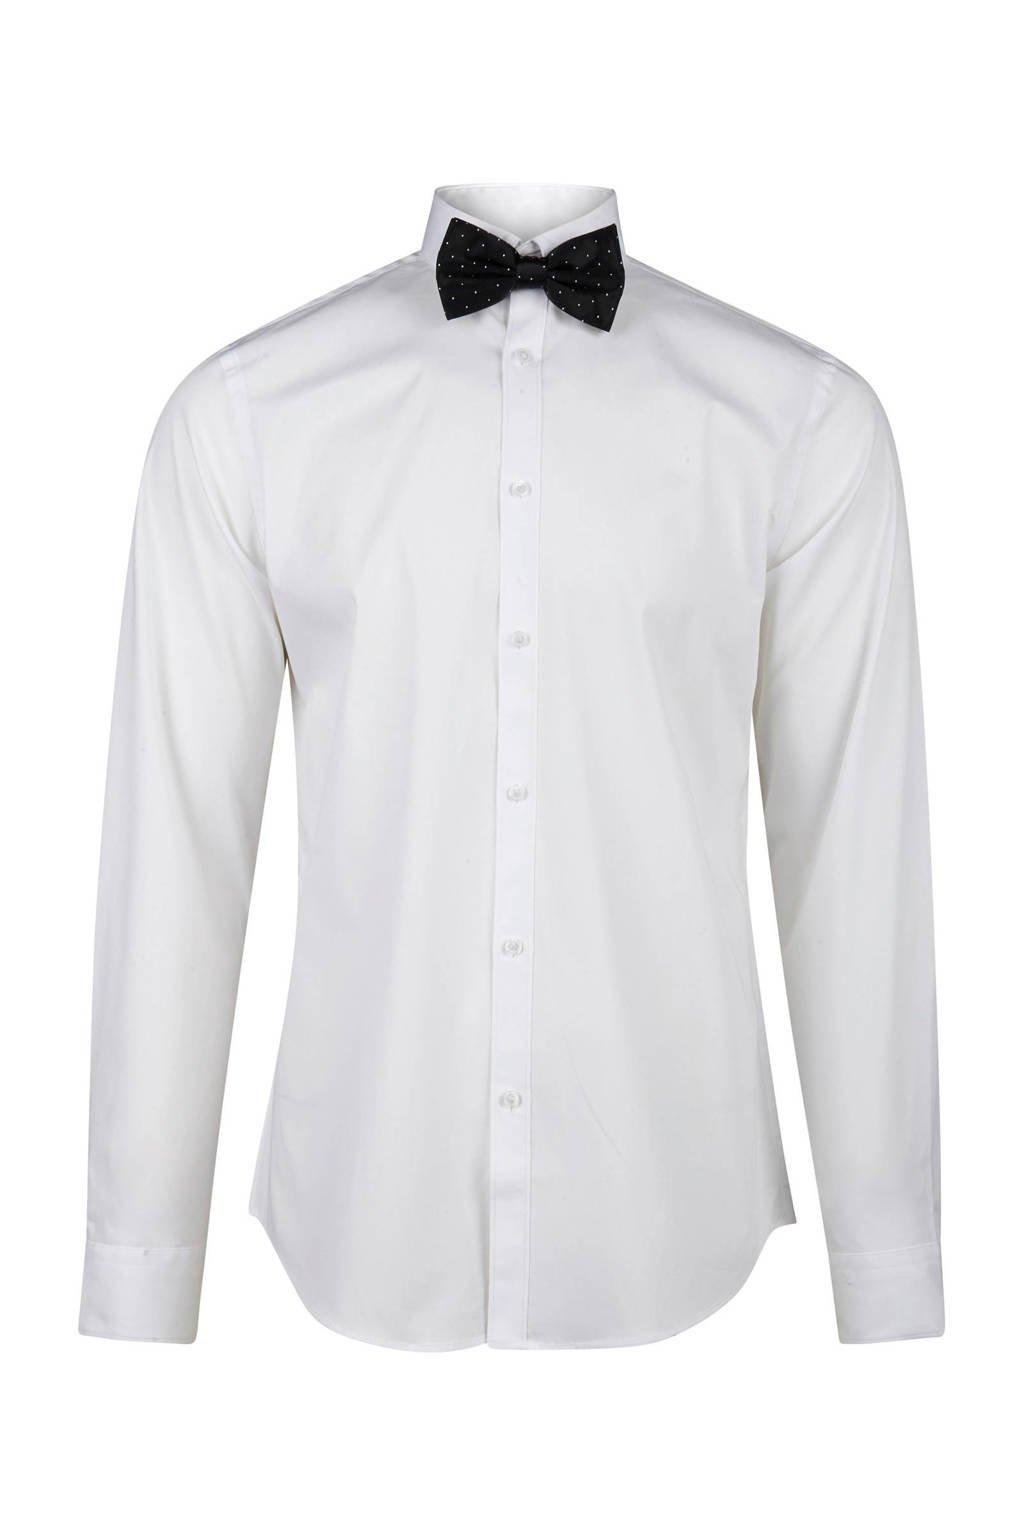 Overhemd Wit Slim Fit.We Fashion Slim Fit Overhemd Wehkamp